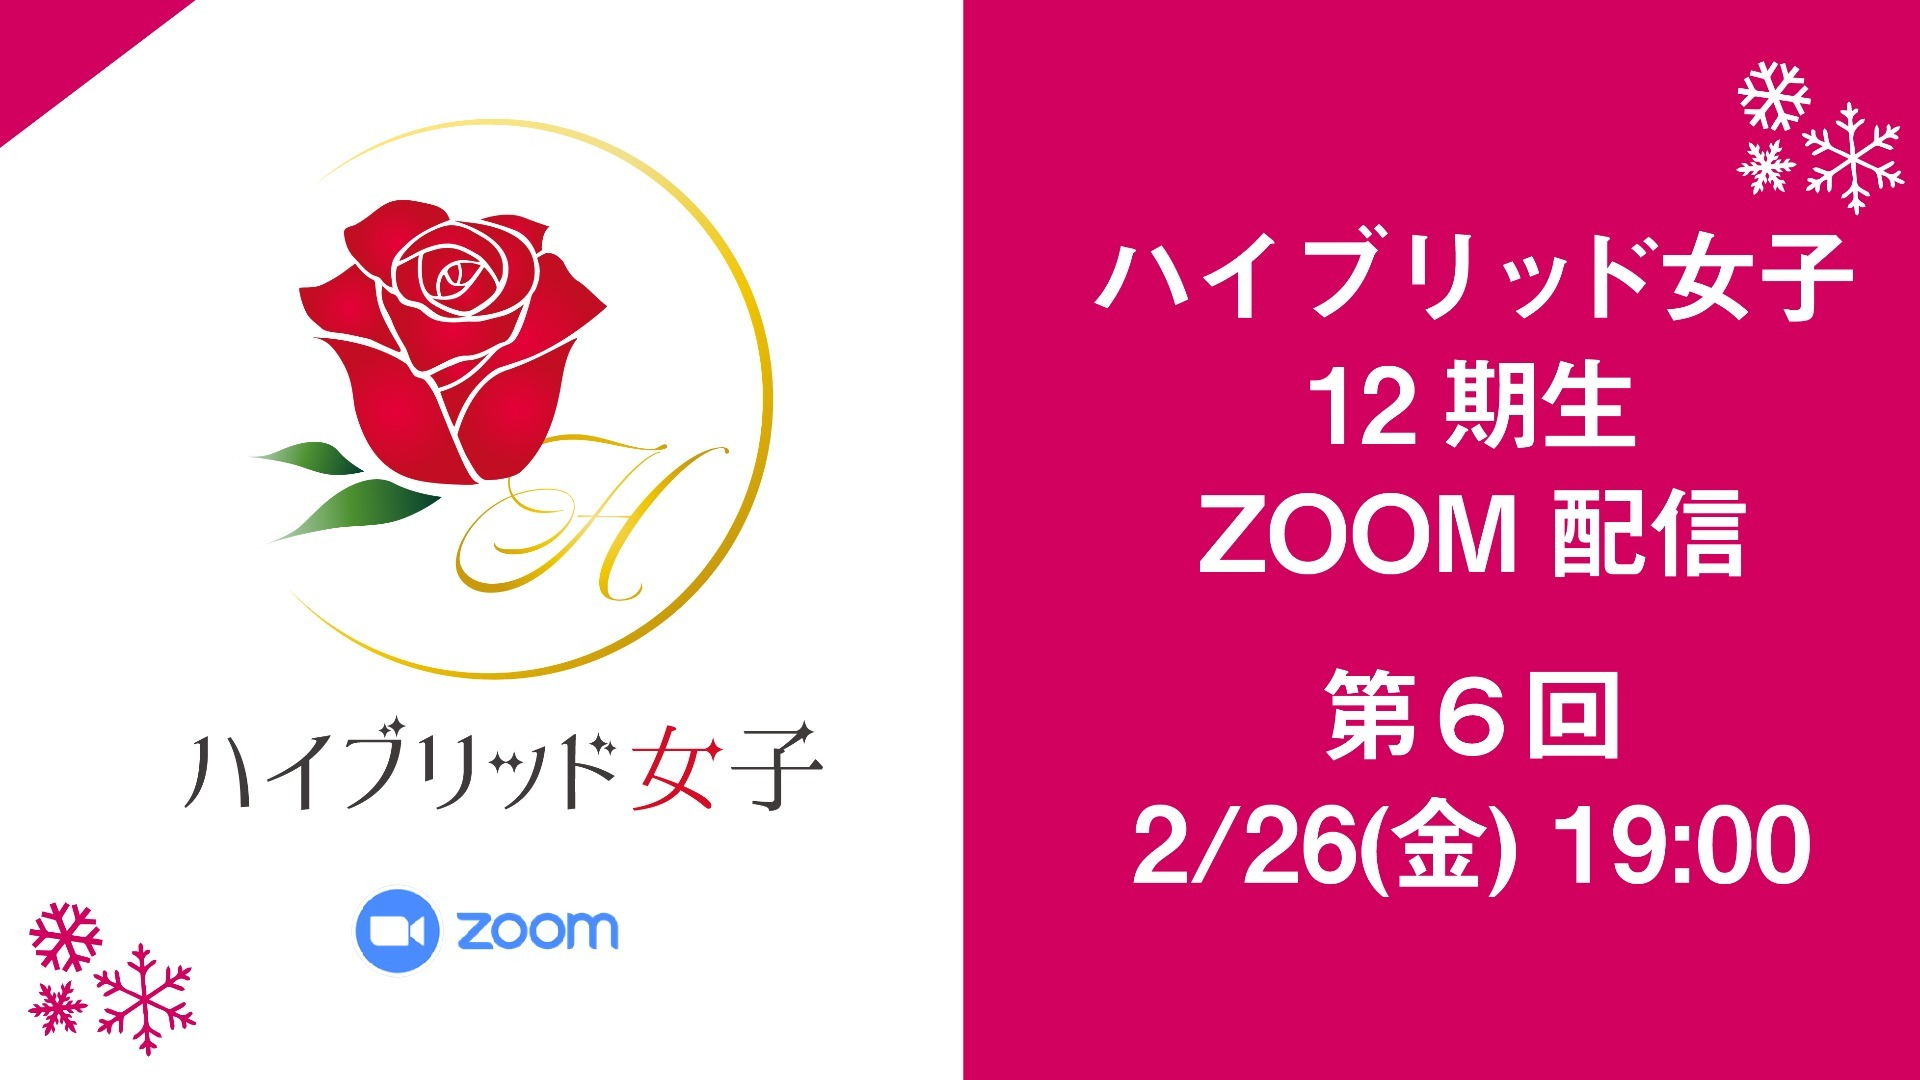 【LIVE】2/26(金)・ZOOMセミナー第5回目